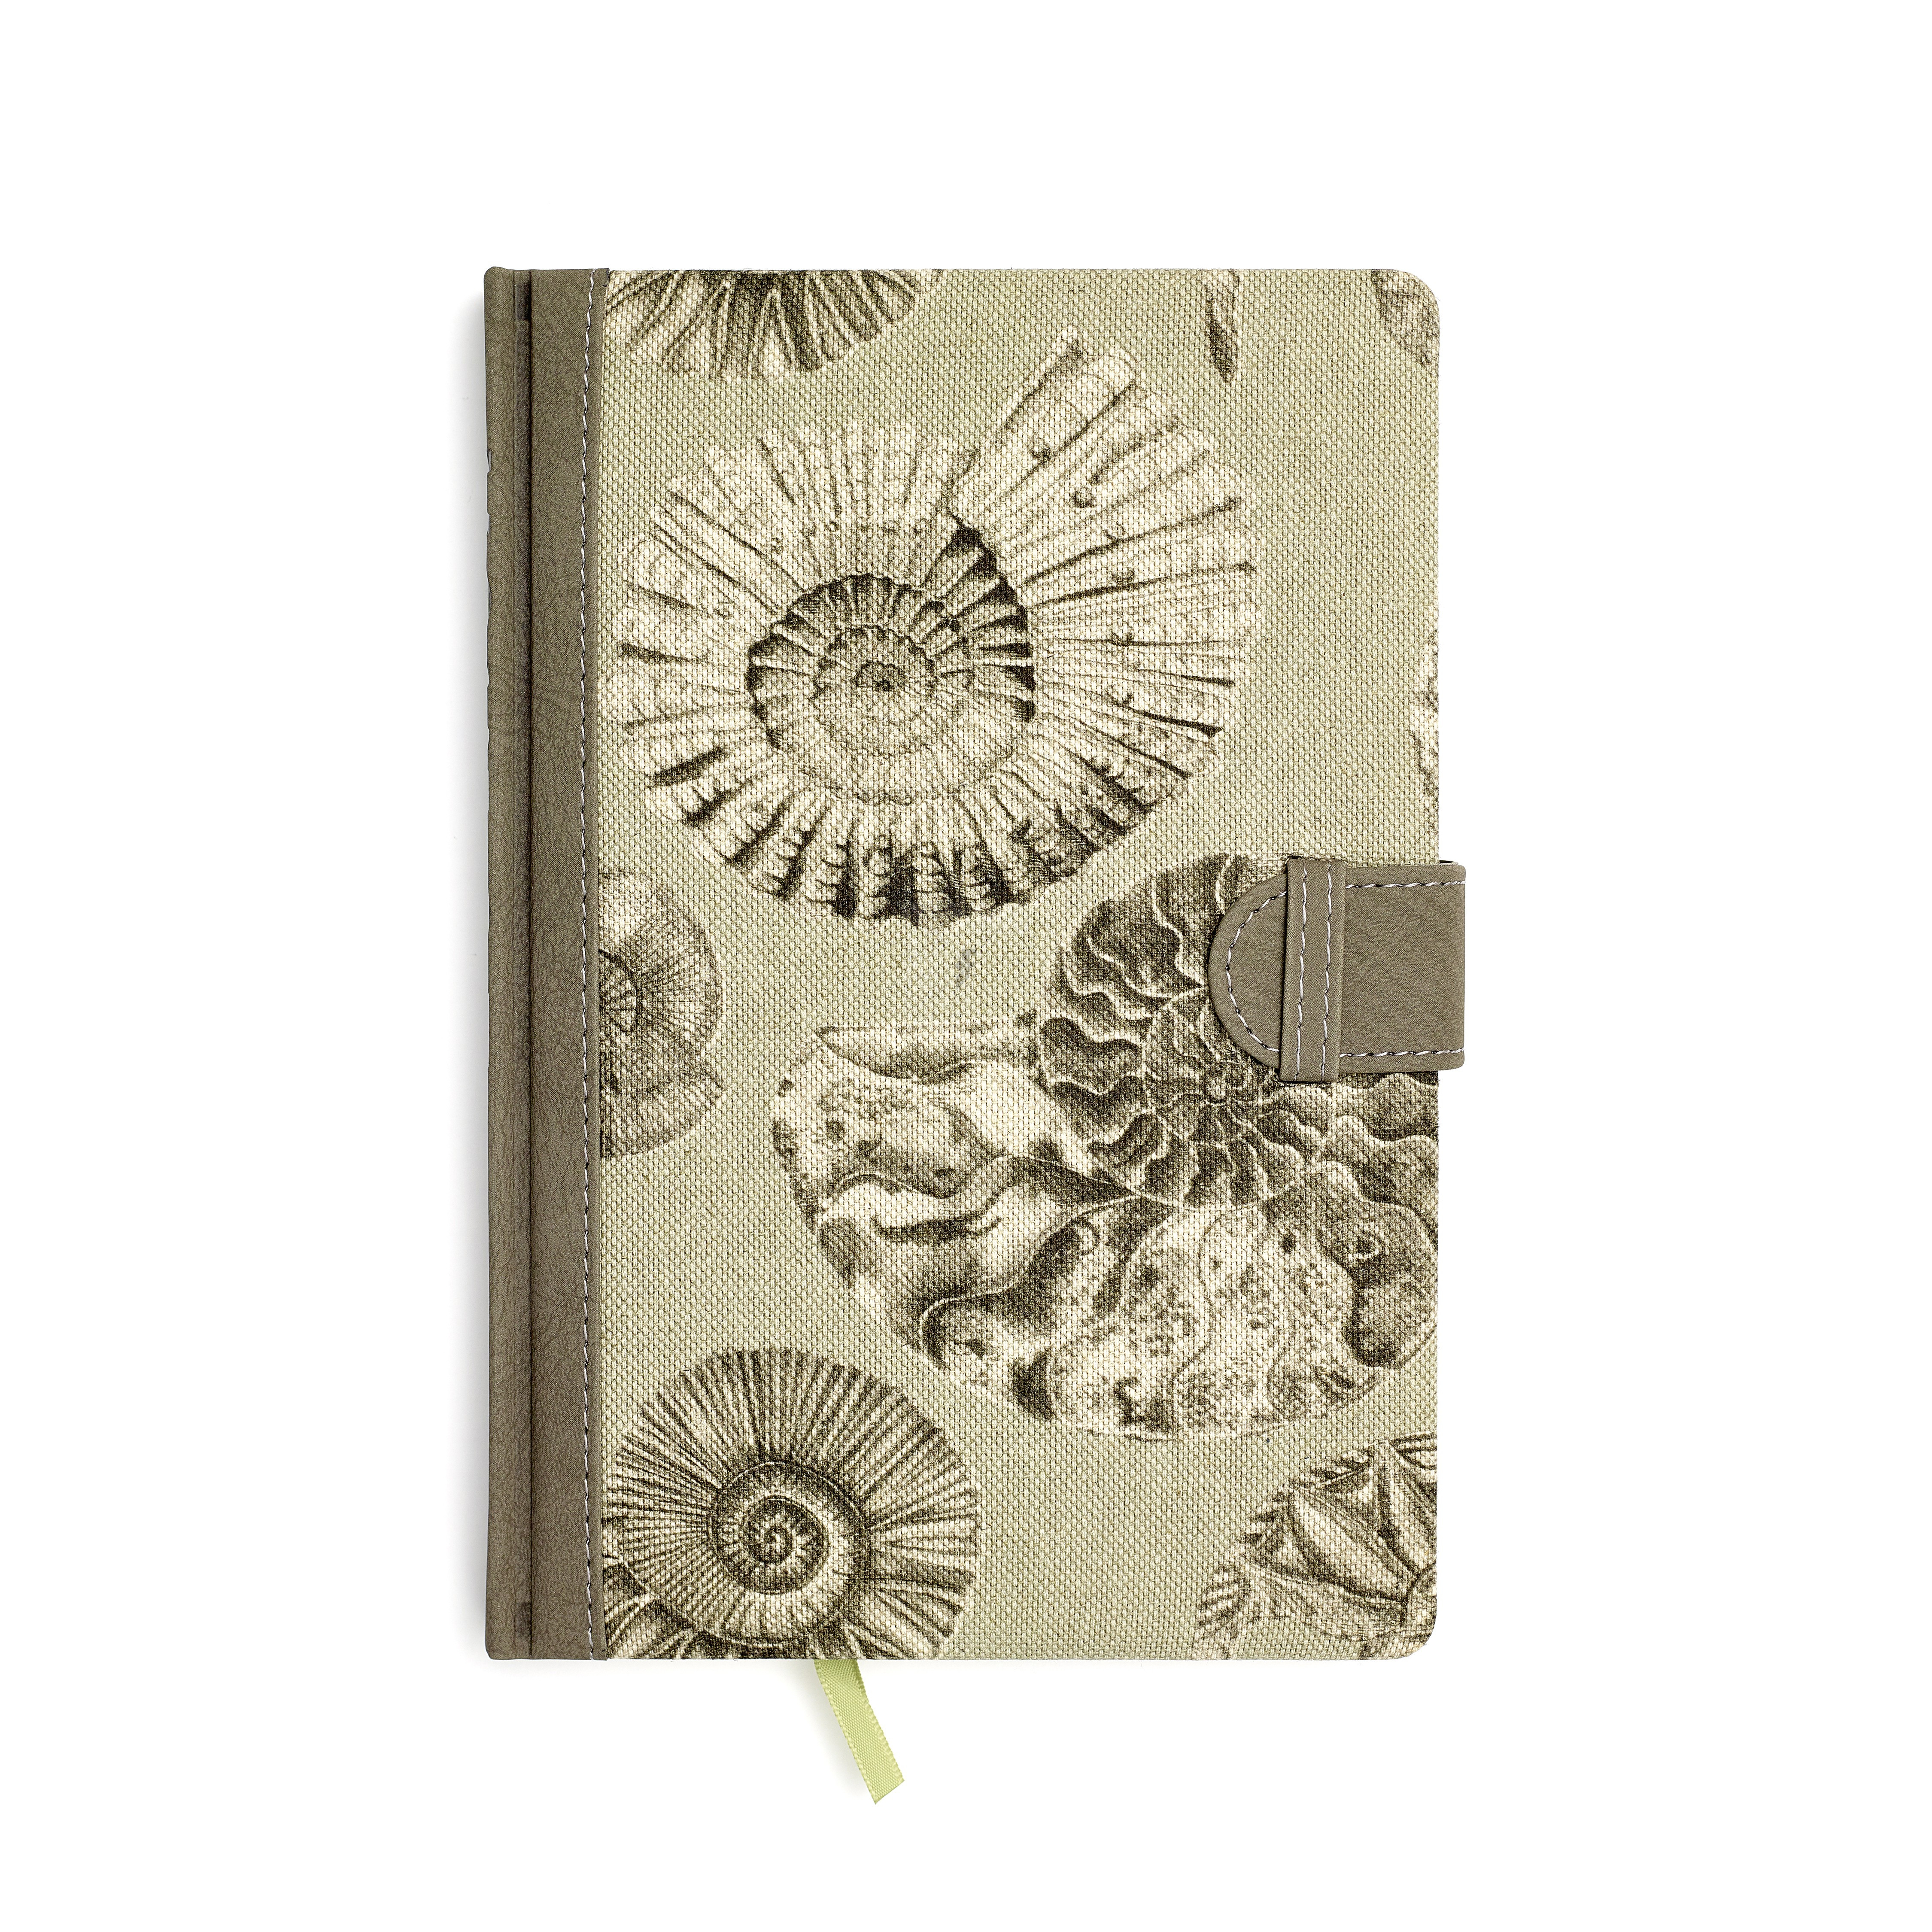 Voyage Maison Fossilium Notebook